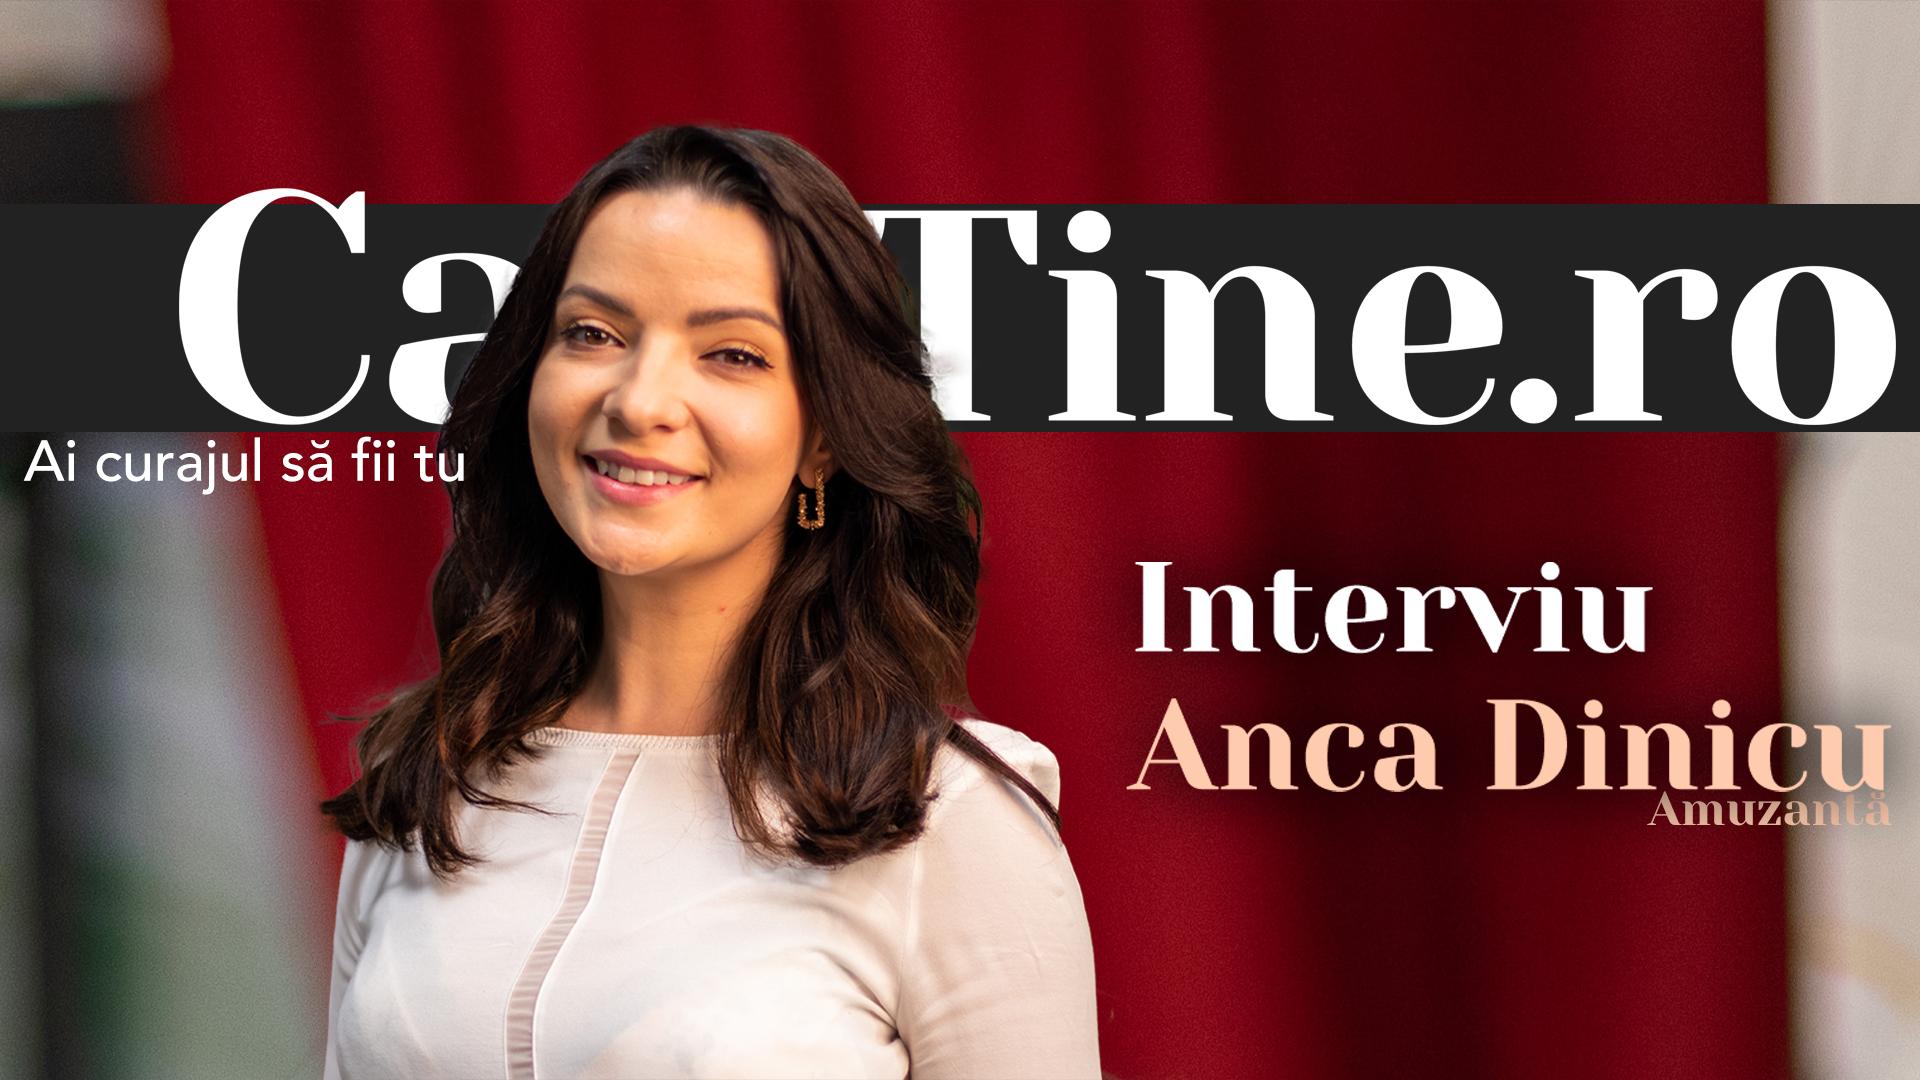 CaTine.Ro - Interviu Anca Dinicu - Smart